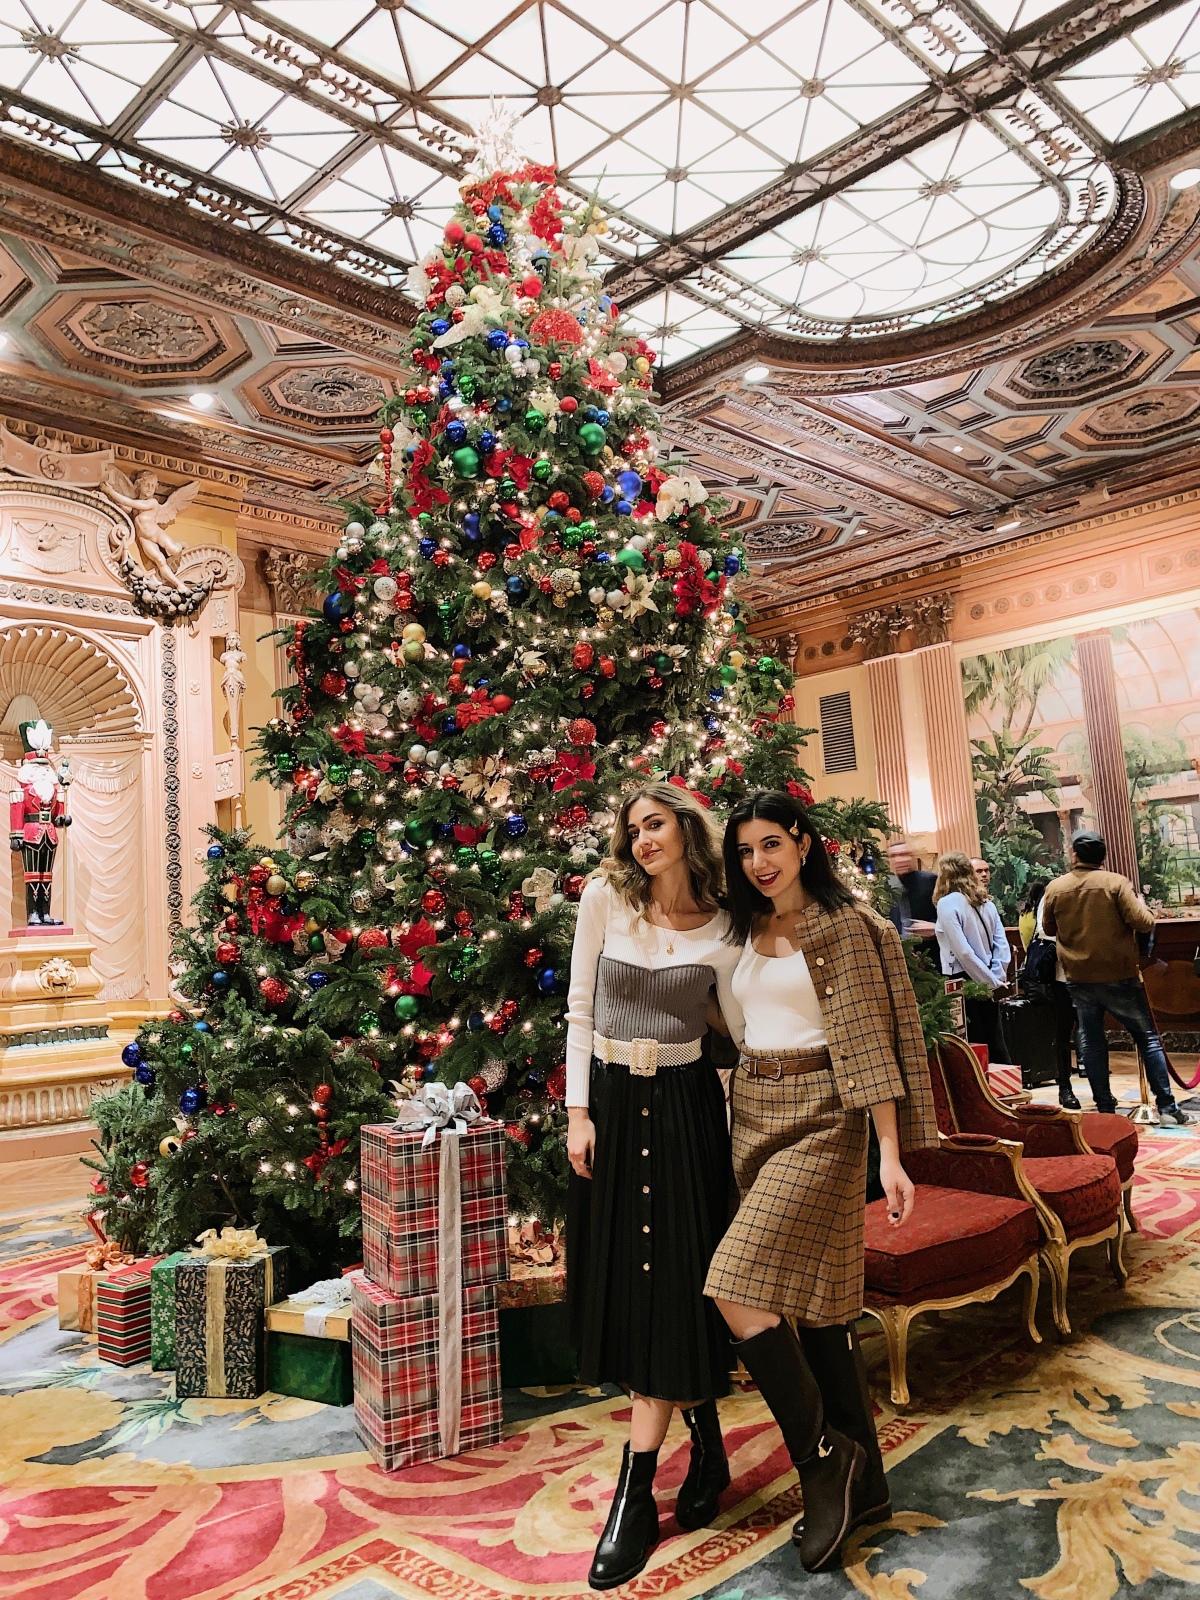 Millenium Biltmore, DTLA, Downtown Los Angeles, art deco, Christmas decor, historic, 1920s, roaring twenties, historic hotel